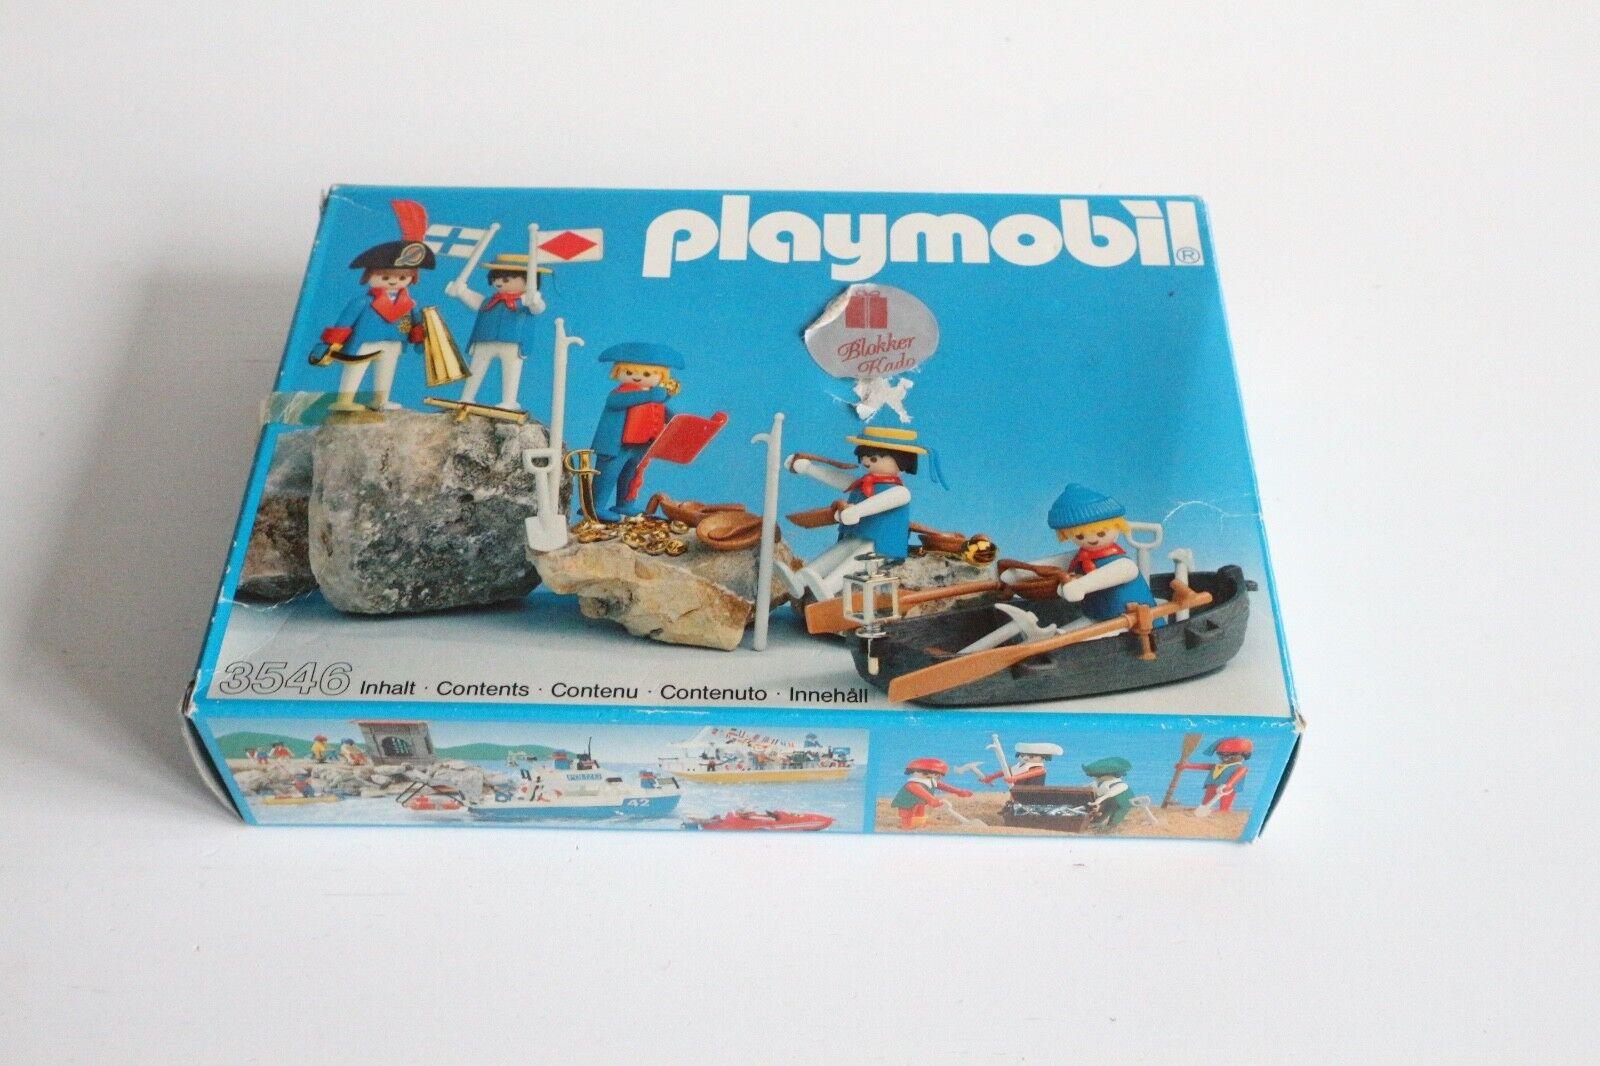 Playmobil 3546 setnr. ovp pirate piraat pirata pirat πειρατής complete set